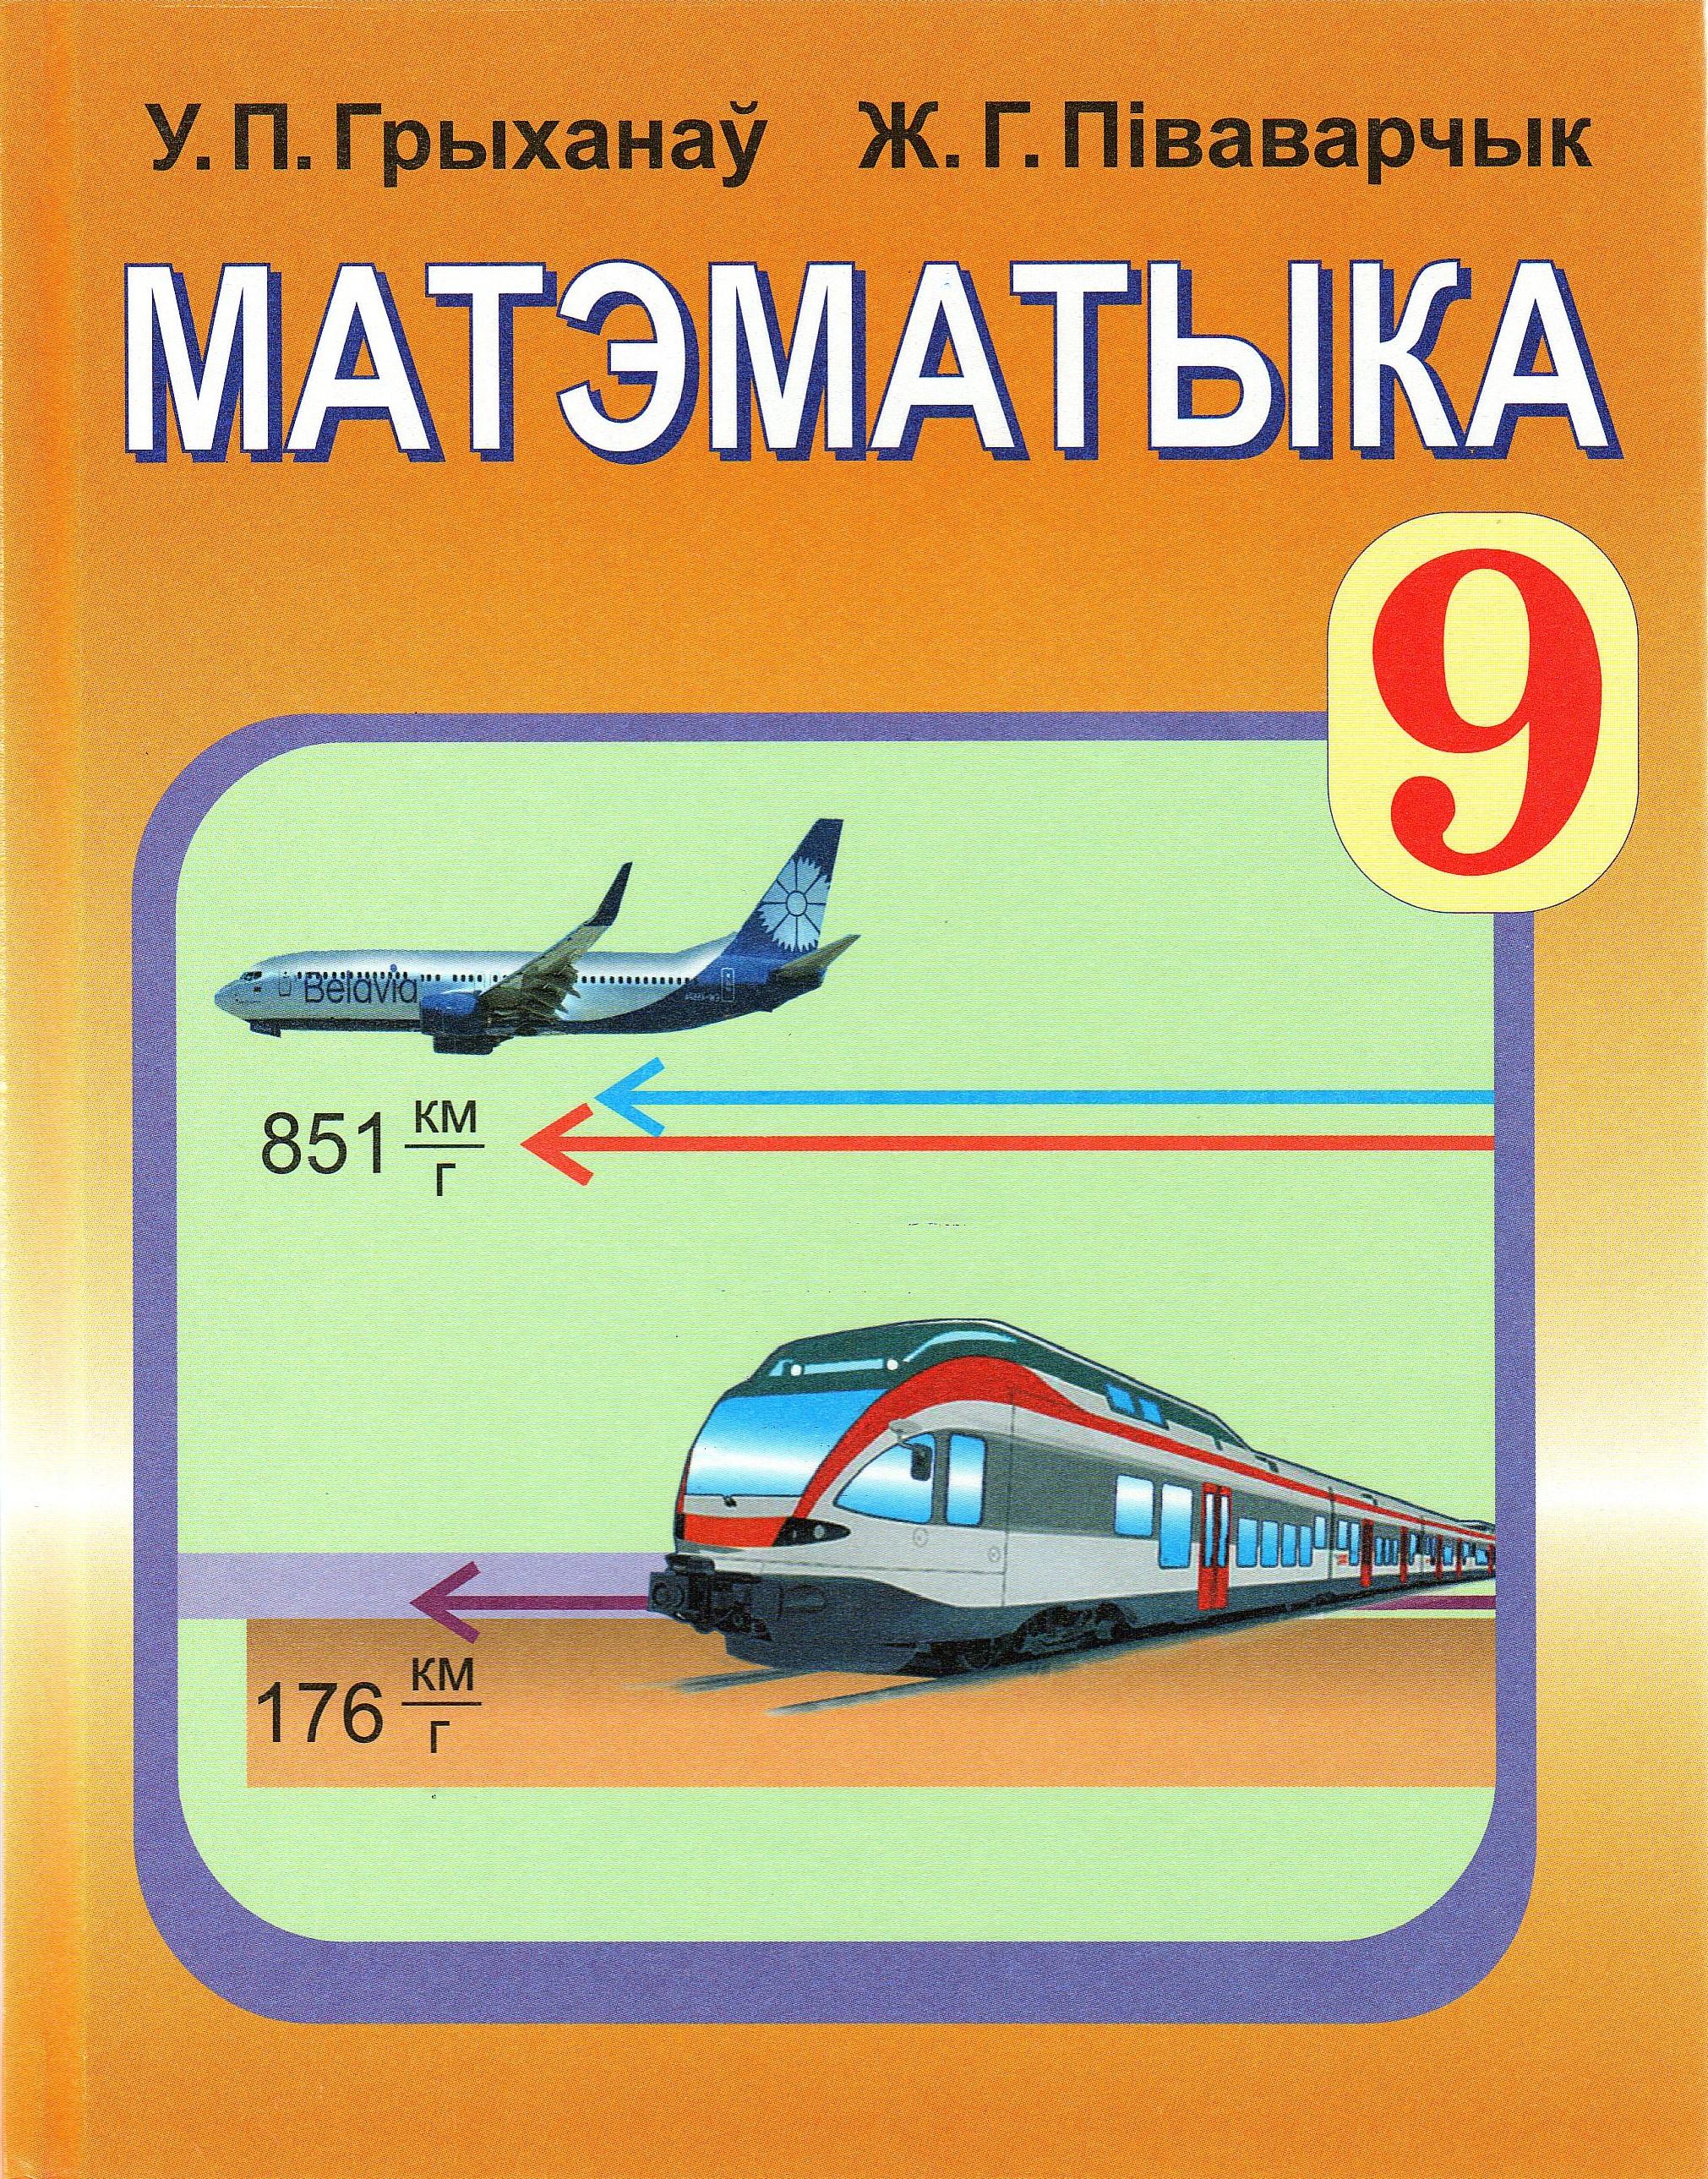 Матэматыка, 9 клас